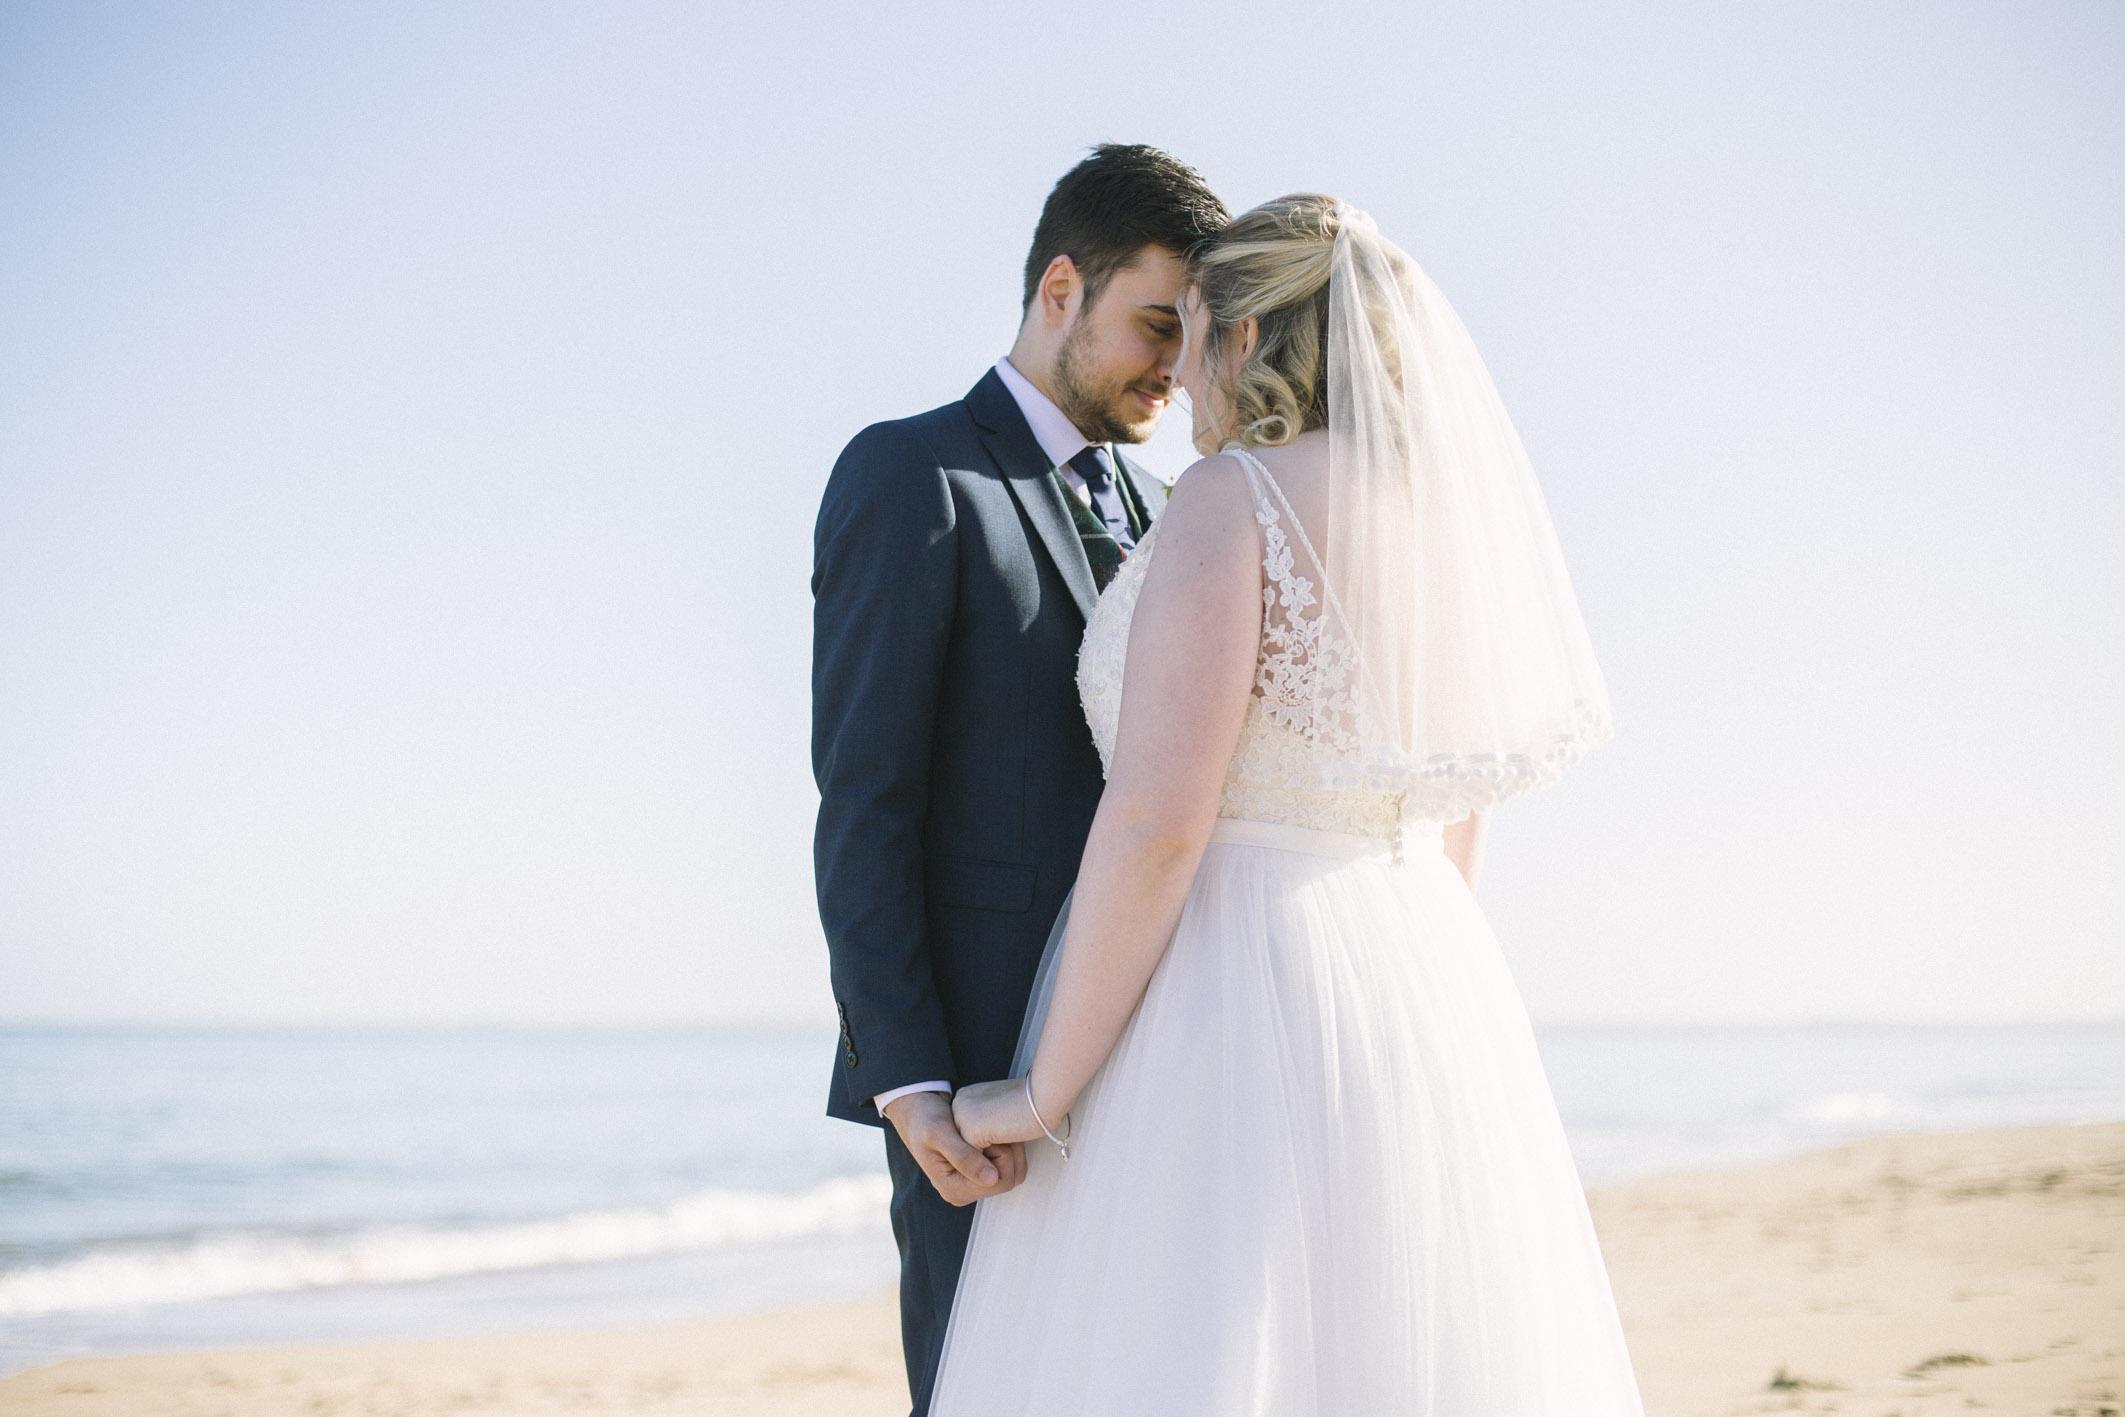 Dornoch Wedding Photography | Scottish Photographer | Alternative Photos | Ceranna Photography | intimate elopement | beach wedding | east coast scotland